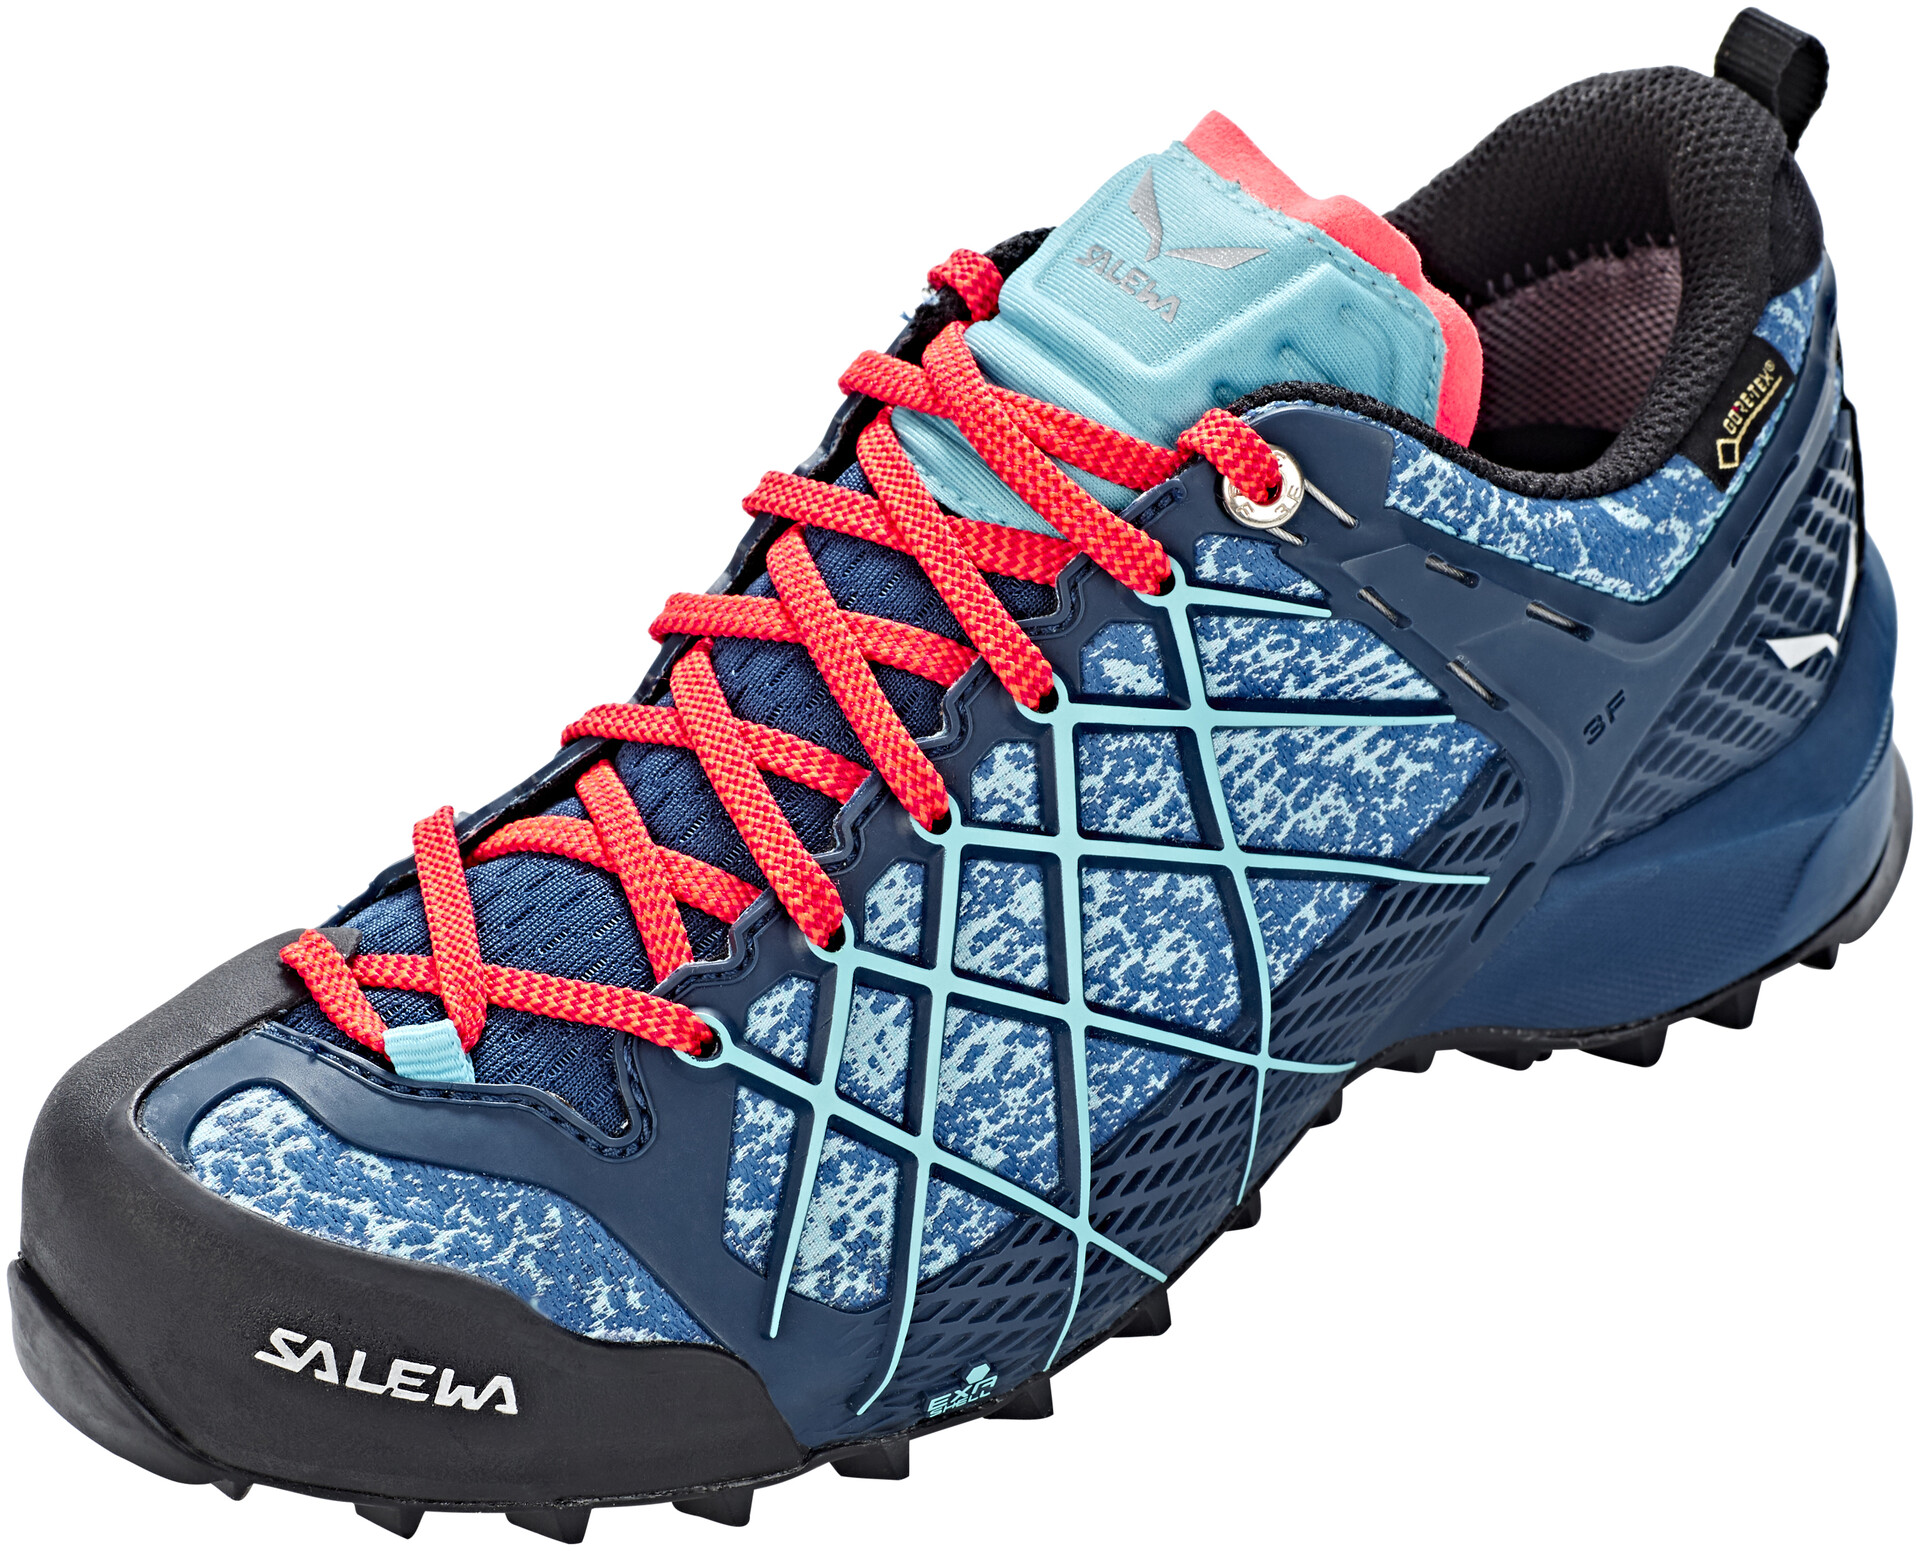 Salewa Wildfire Edge GTX Mid Cut Schuhe Damen Poseidon